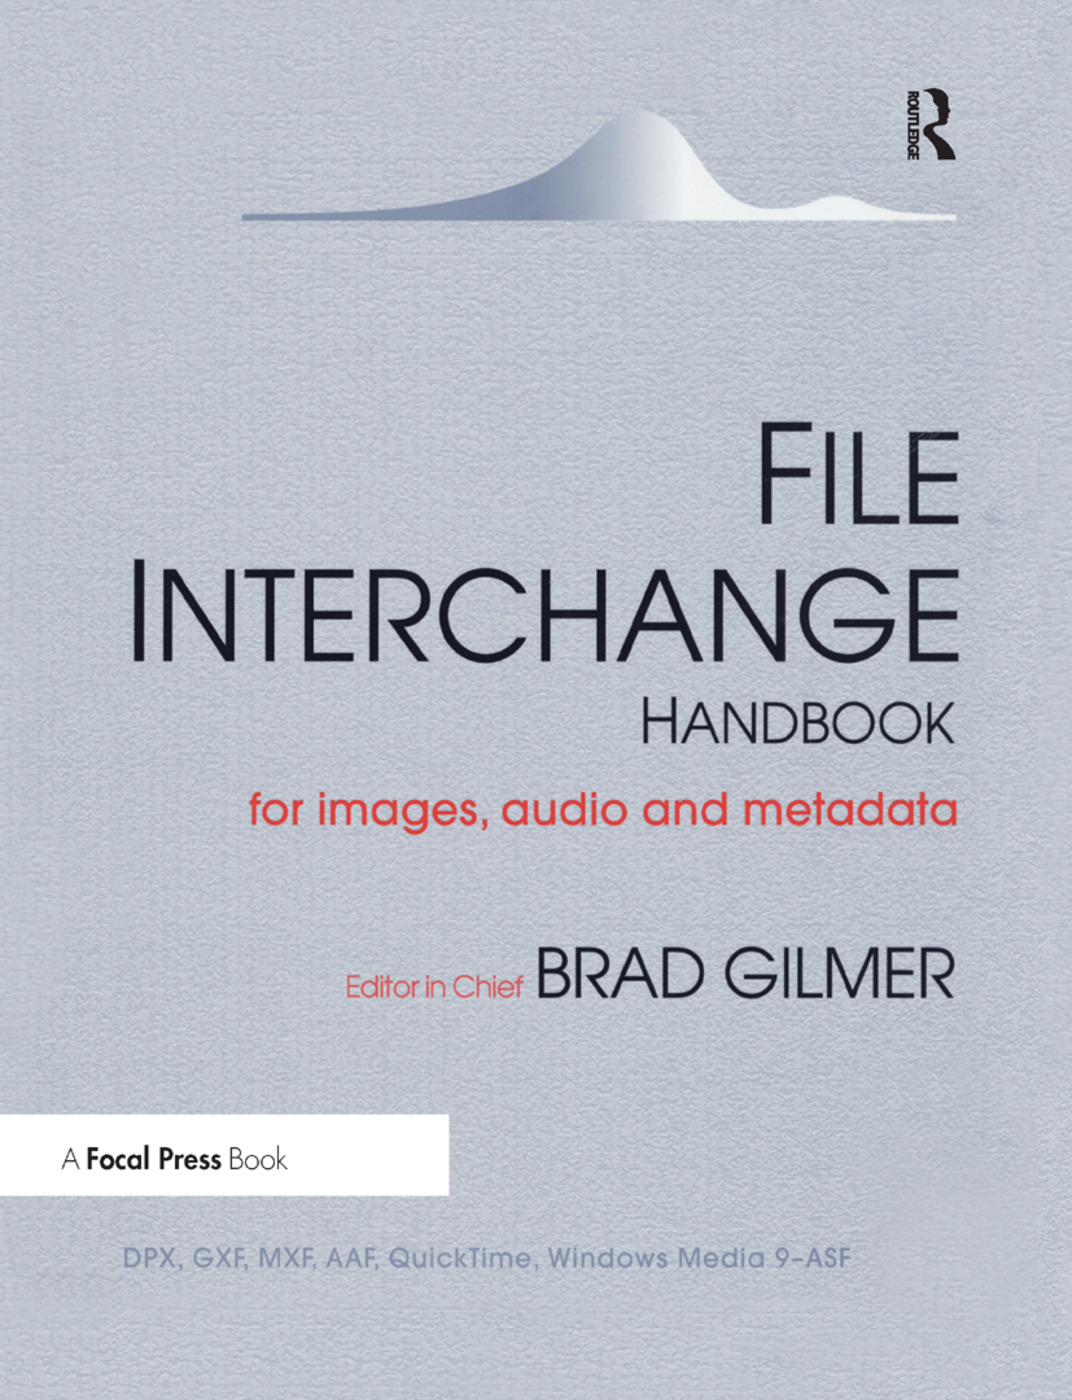 File Interchange Handbook